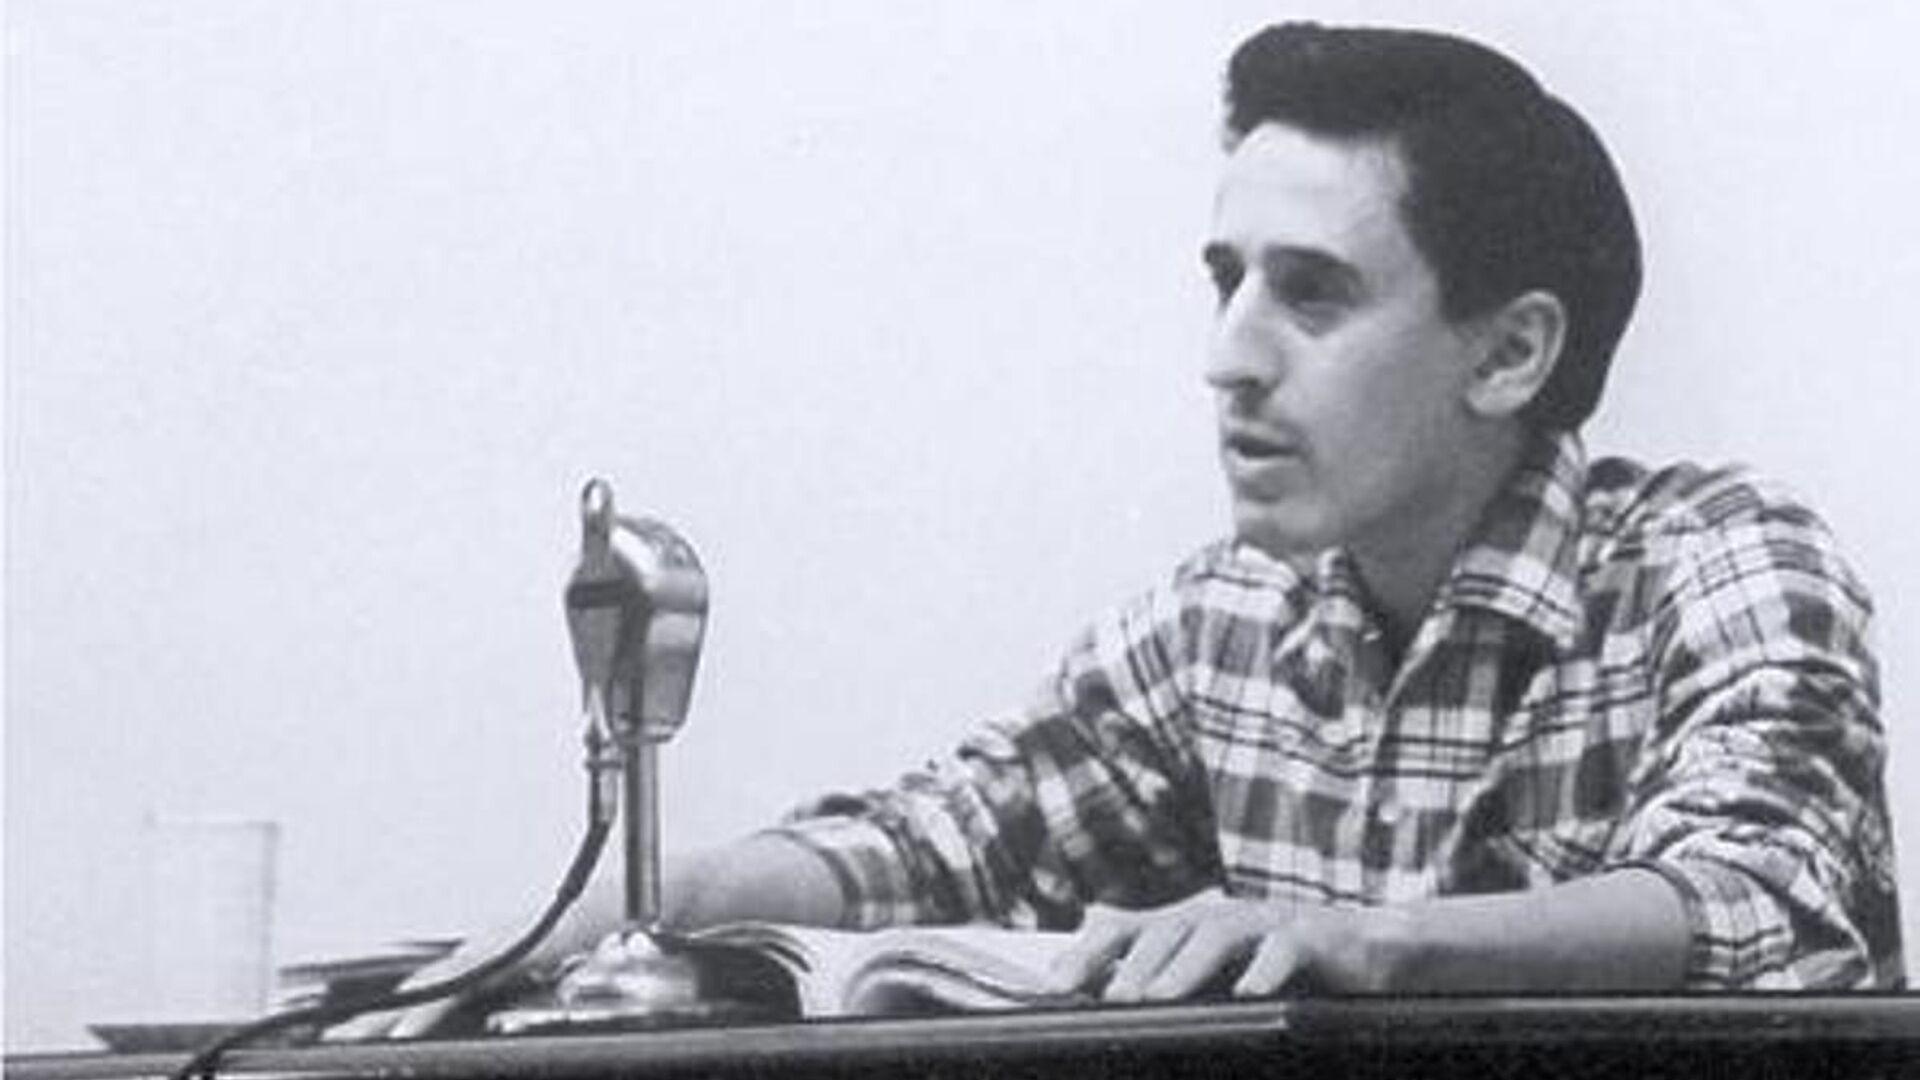 El poeta salvadoreño Roque Dalton - Sputnik Mundo, 1920, 10.05.2021